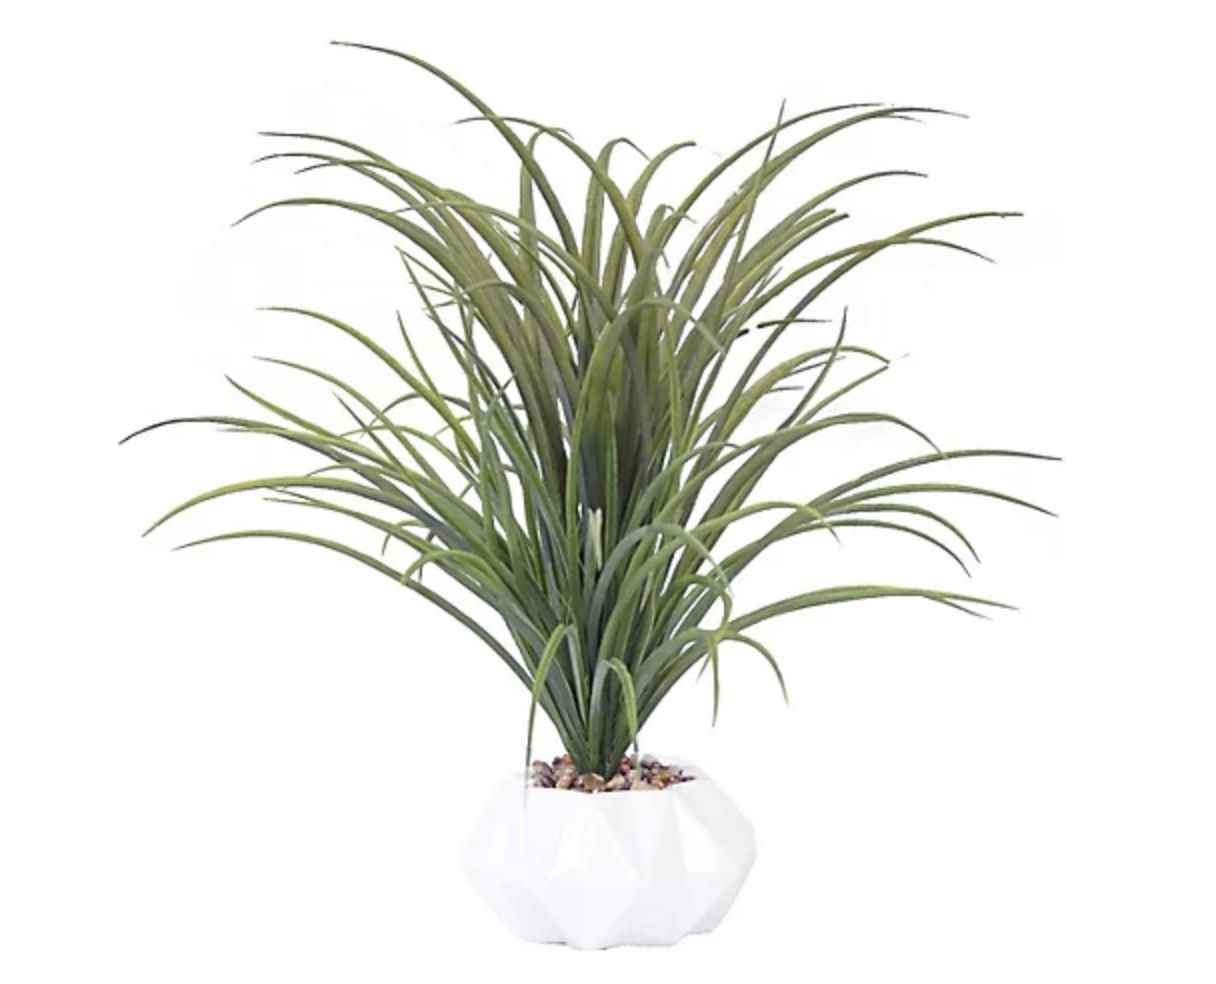 grass in vase